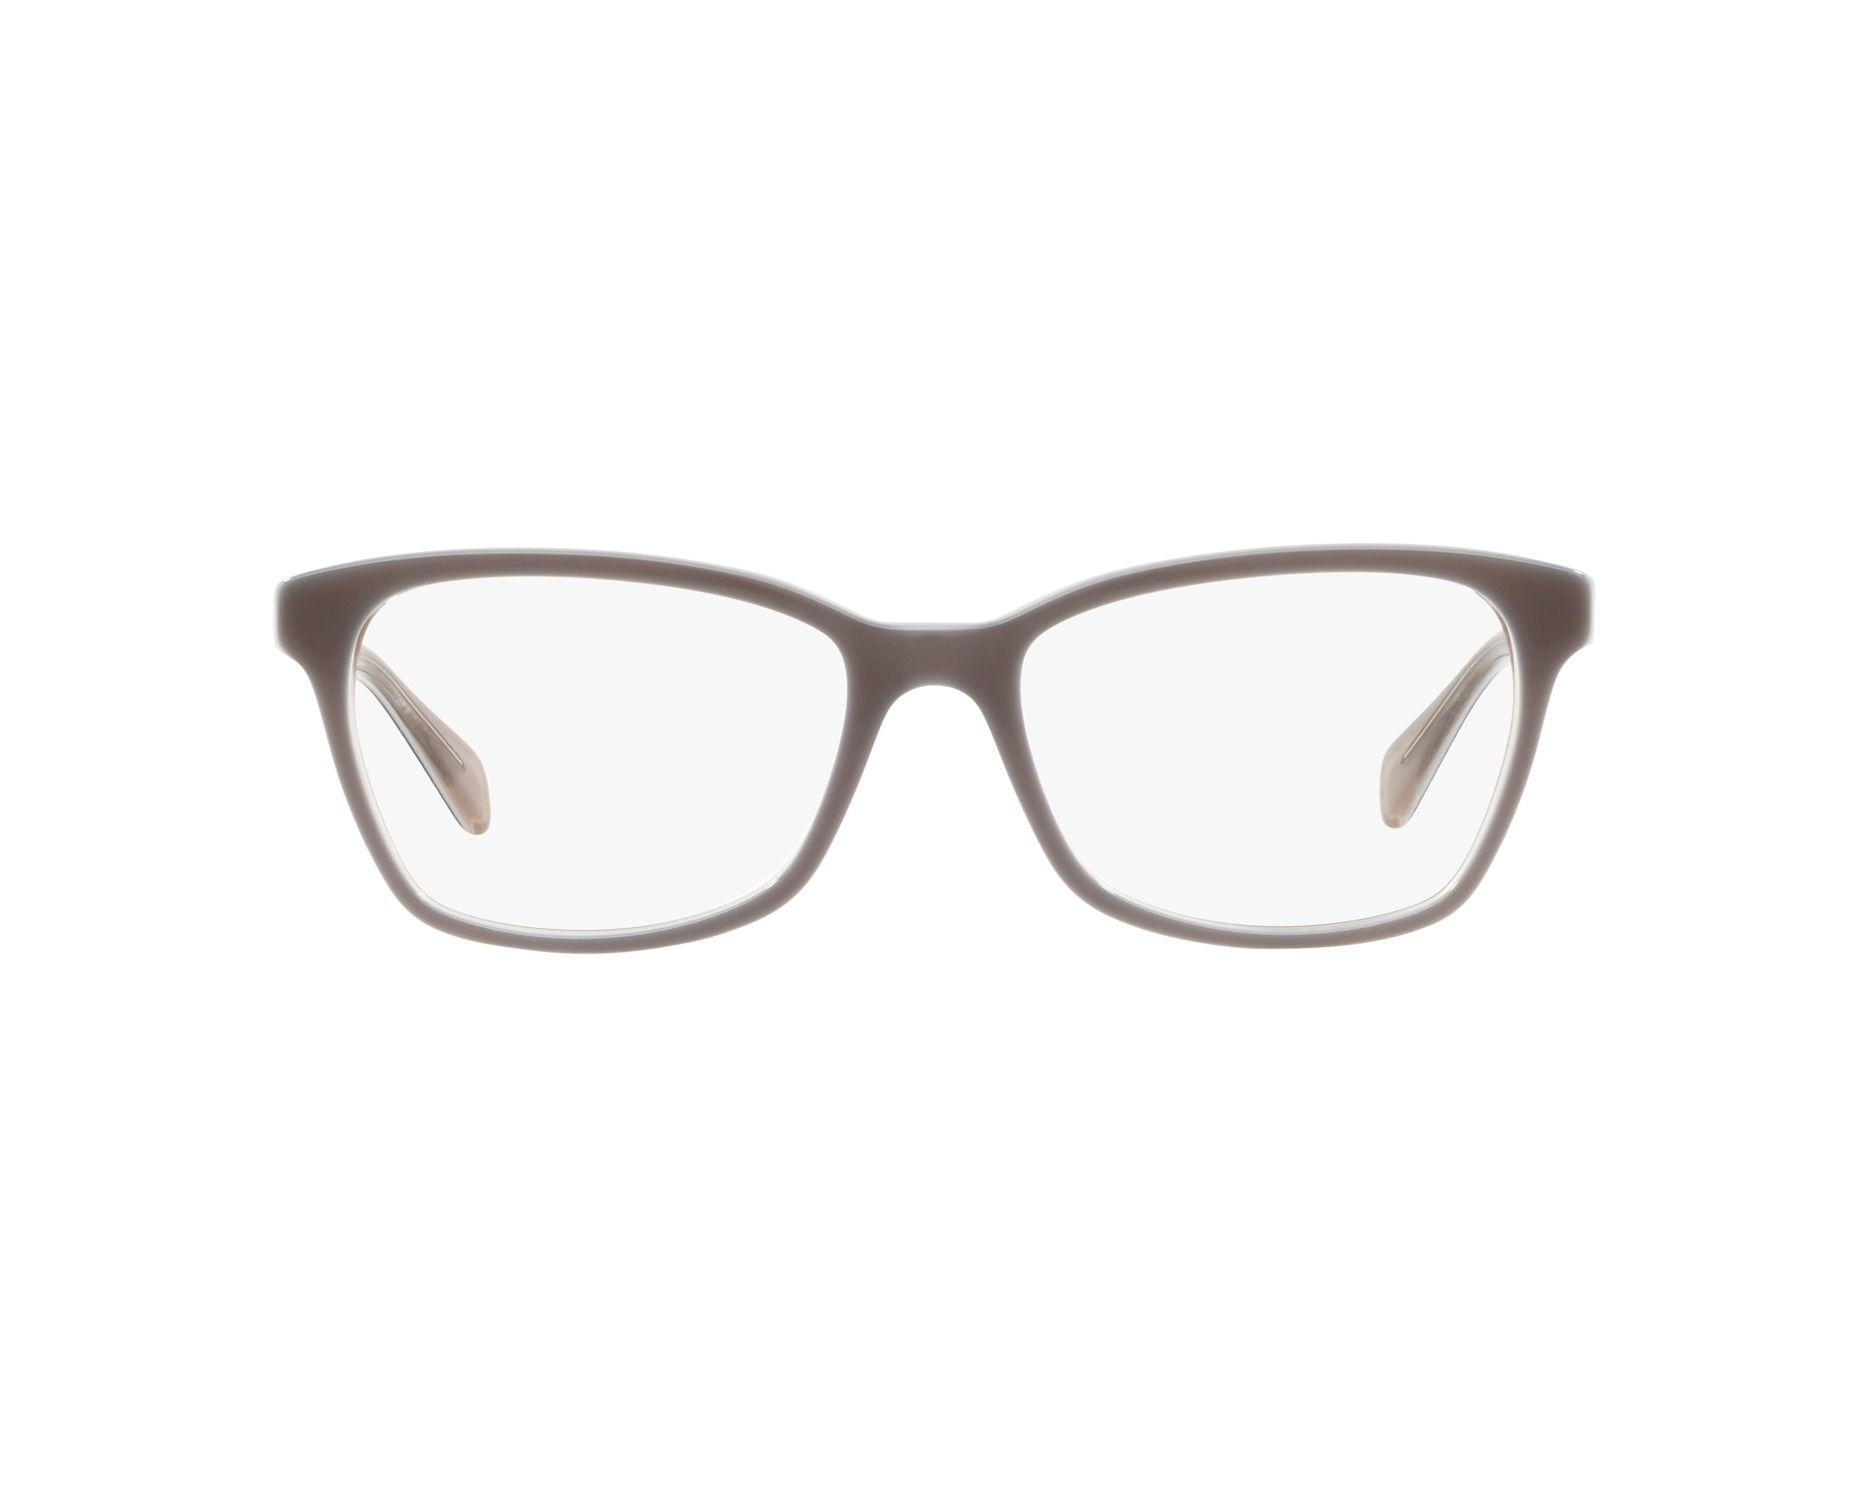 1321ed375af eyeglasses Ray-Ban RX-5362 5778 52-17 Grey Crystal 360 degree view